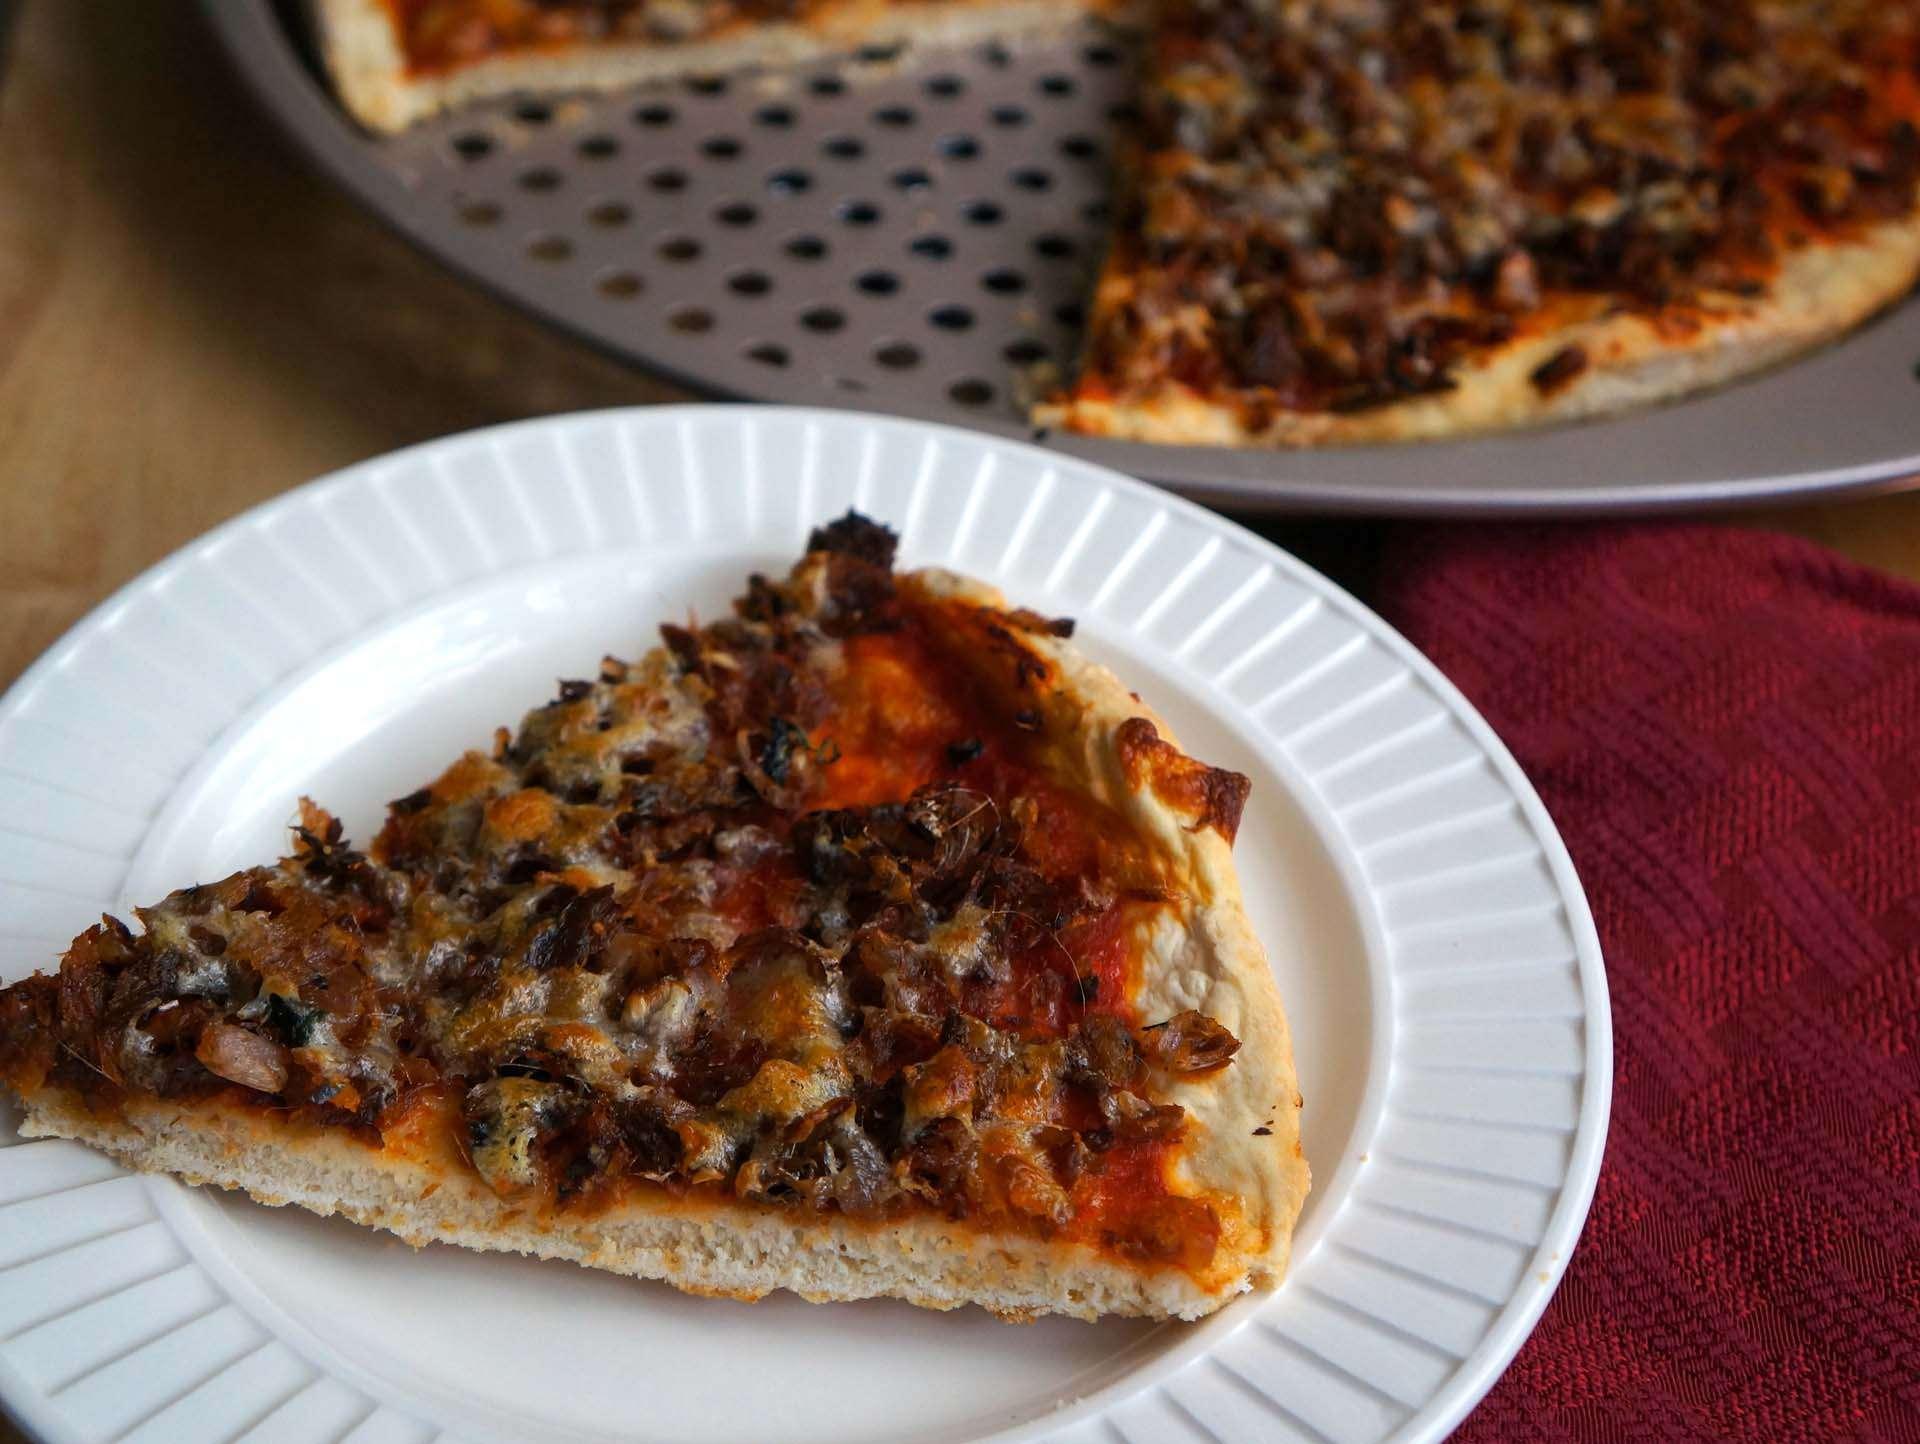 Spicy Smoked Herring Pizza